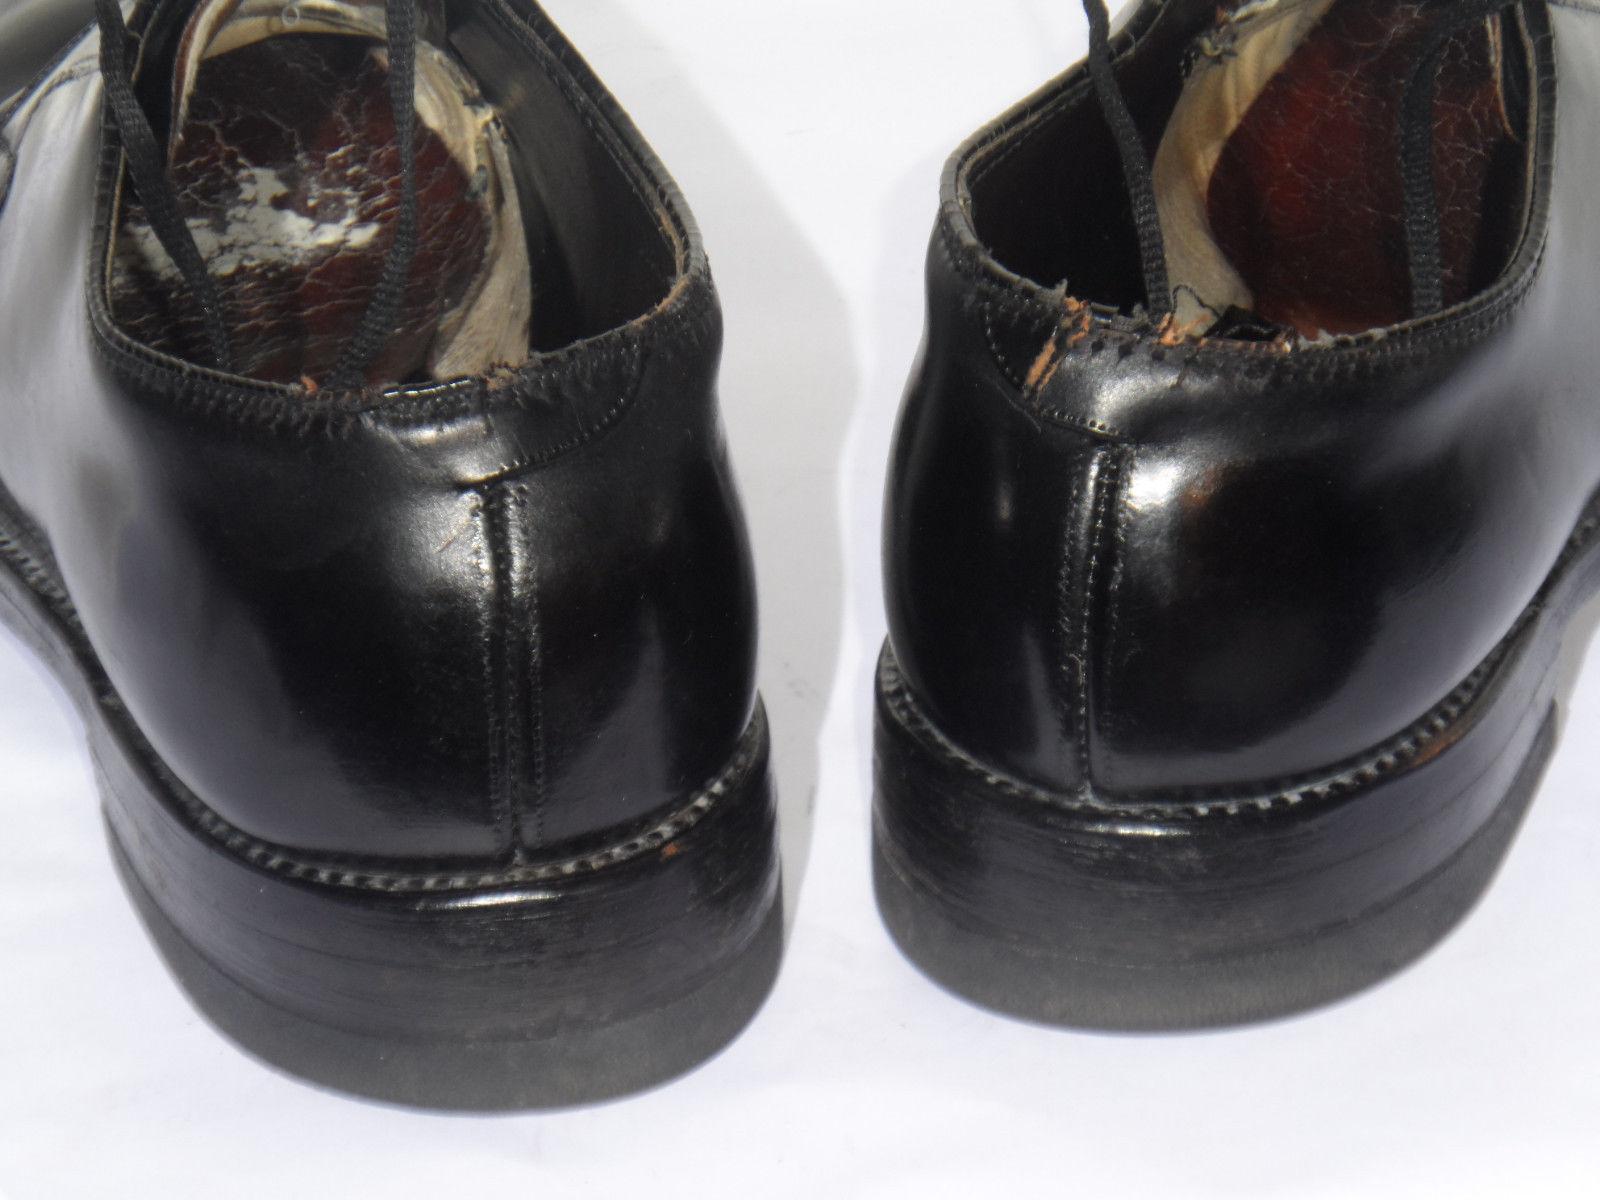 Mens Cordovan Dress Shoes With Vibram Soles